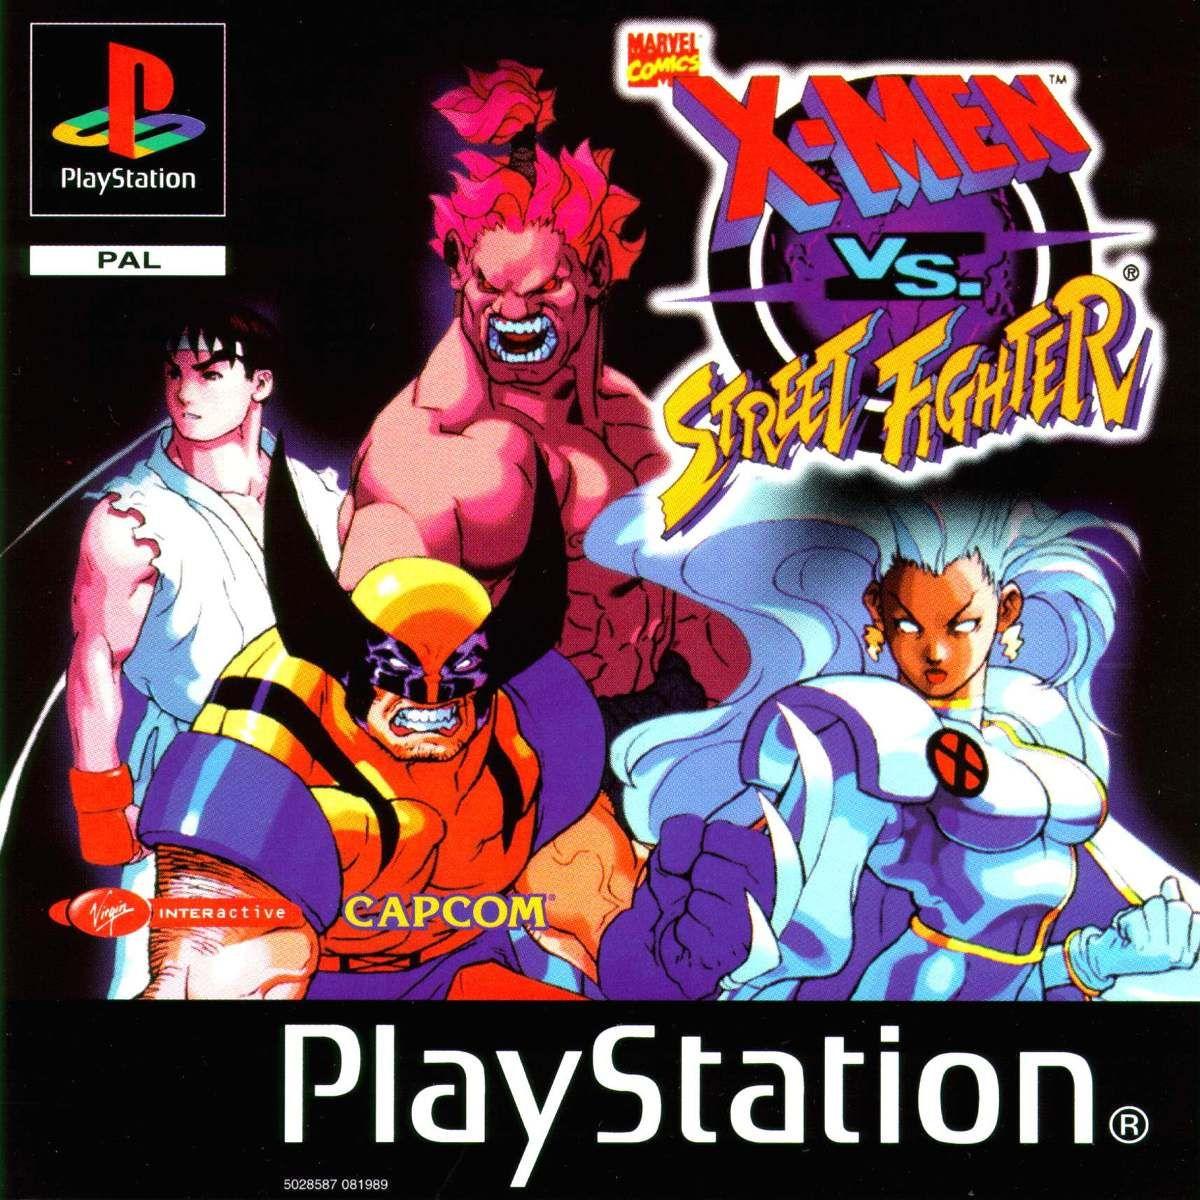 X Men Vs Street Fighter Psp Ps1 Ps2 R 15 99 Em Mercado